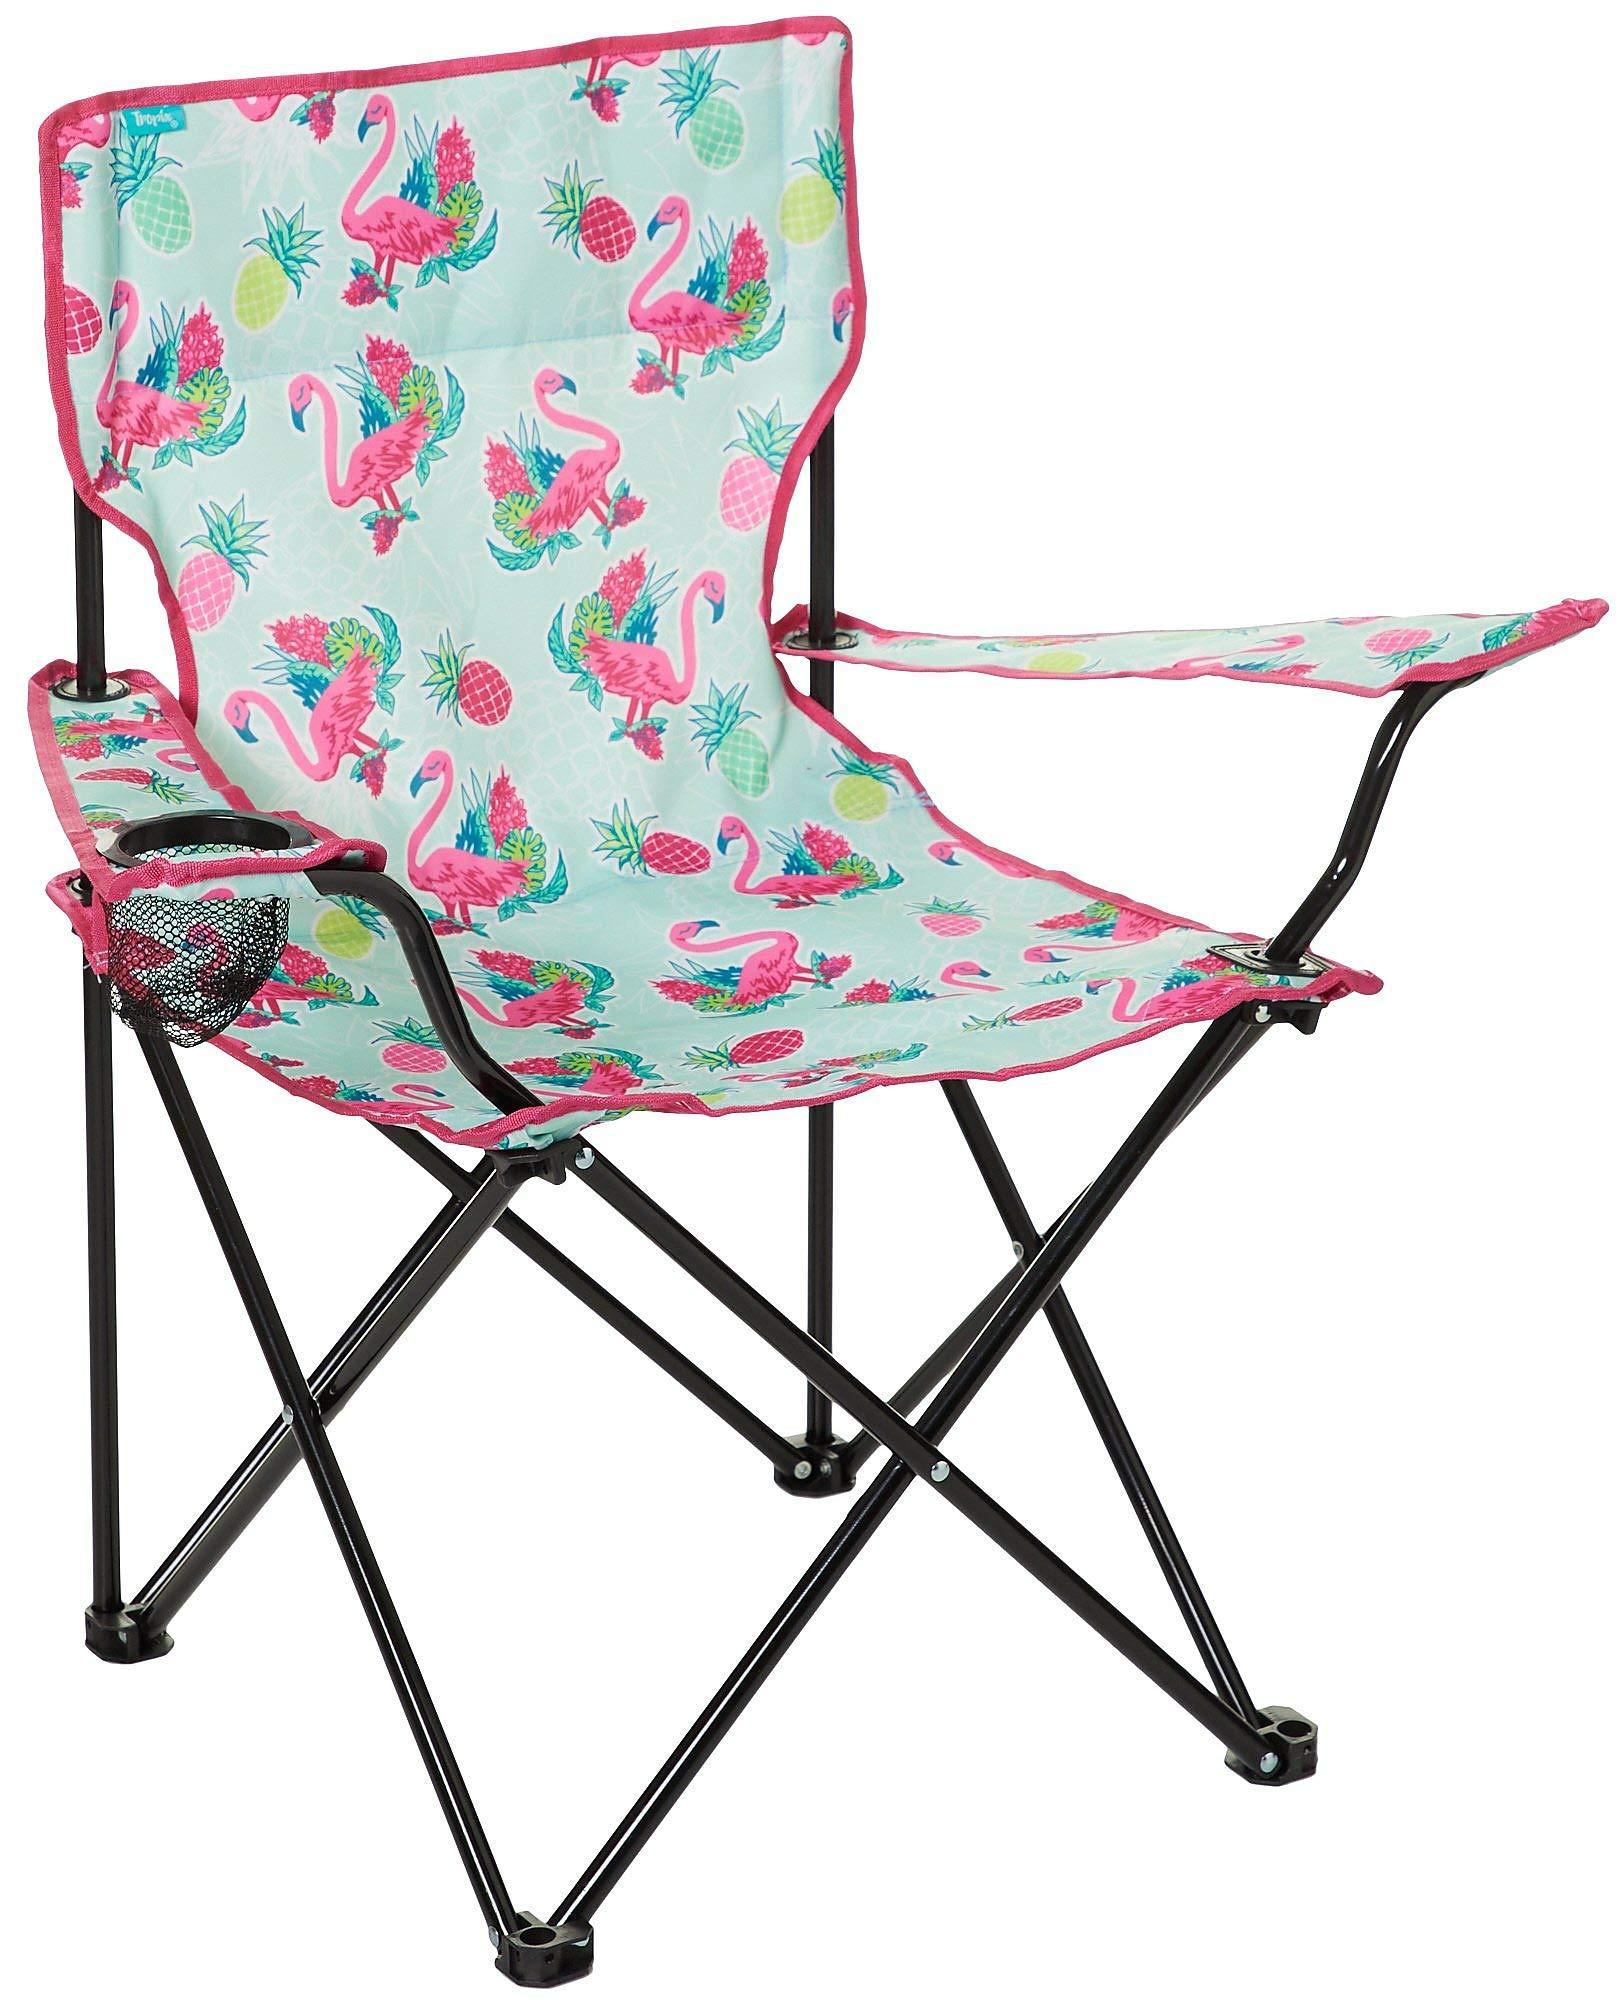 Tropix Flamingo Quad Chair One Size Pink/Green/Blue